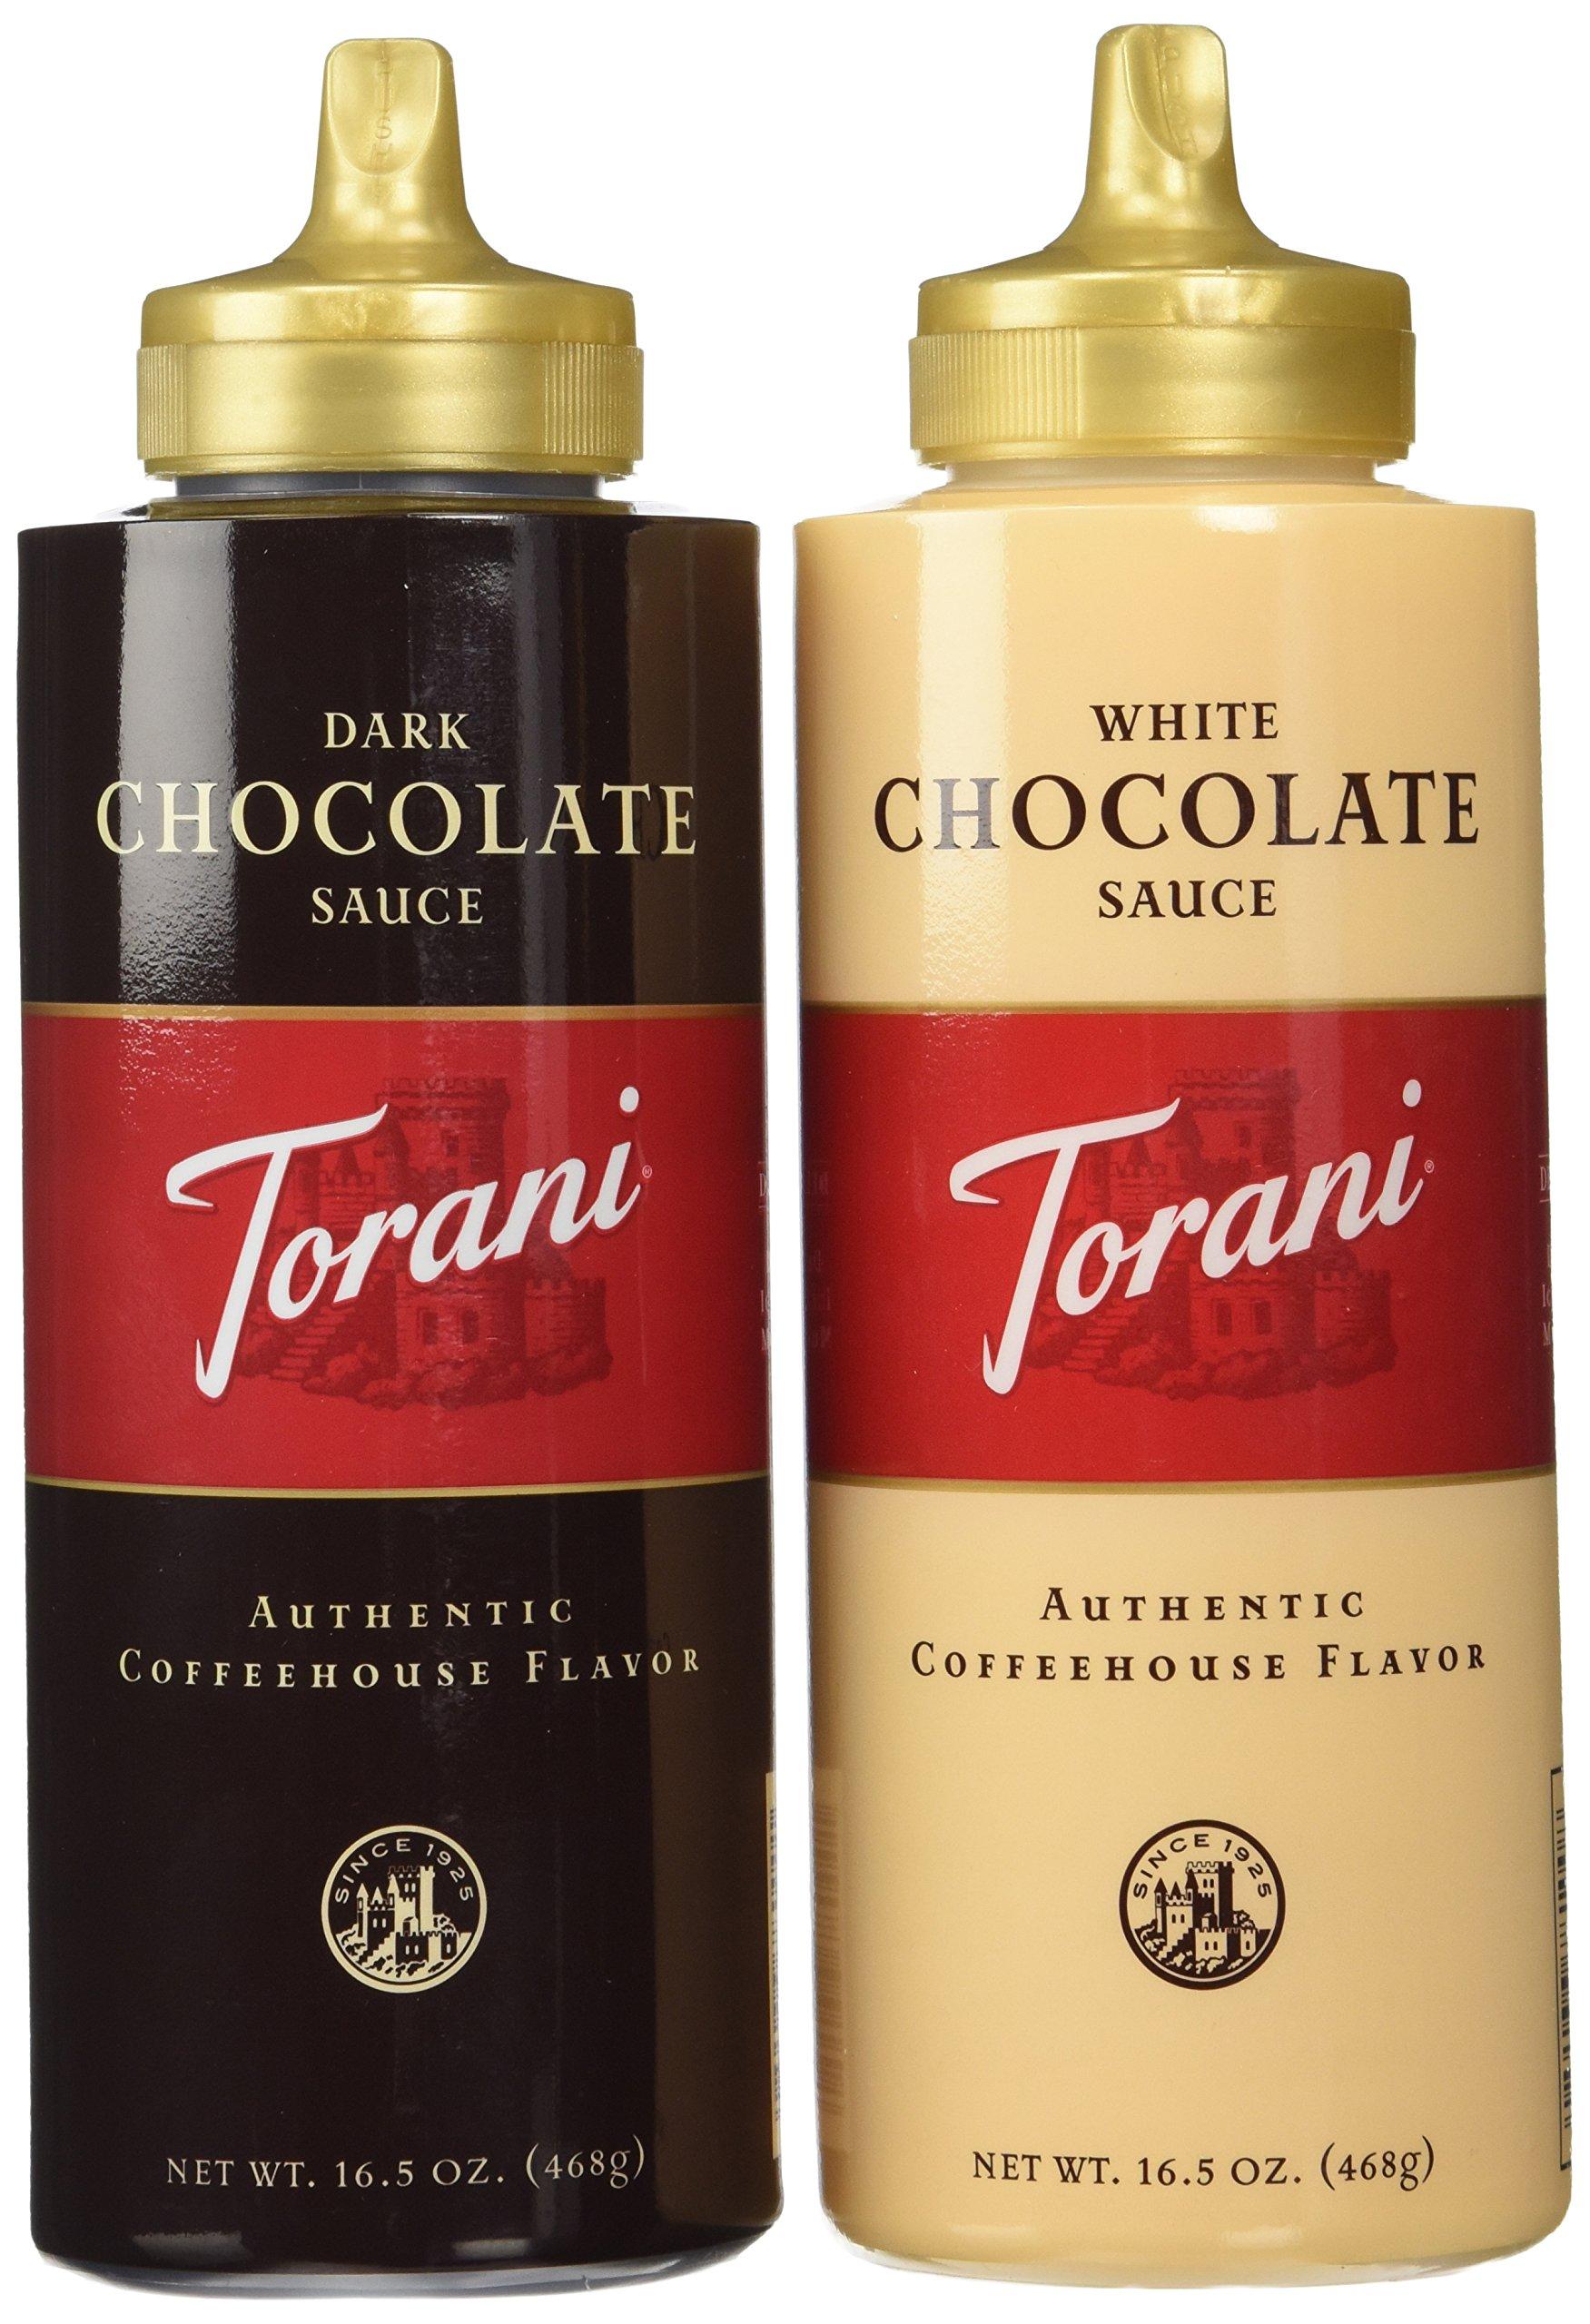 Torani Chocolate Sauce 2 Flavor Variety Pack: (1) Torani Dark Chocolate Suace, and (1) Torani White Chocolate Sauce, 16.5 Oz. Ea.